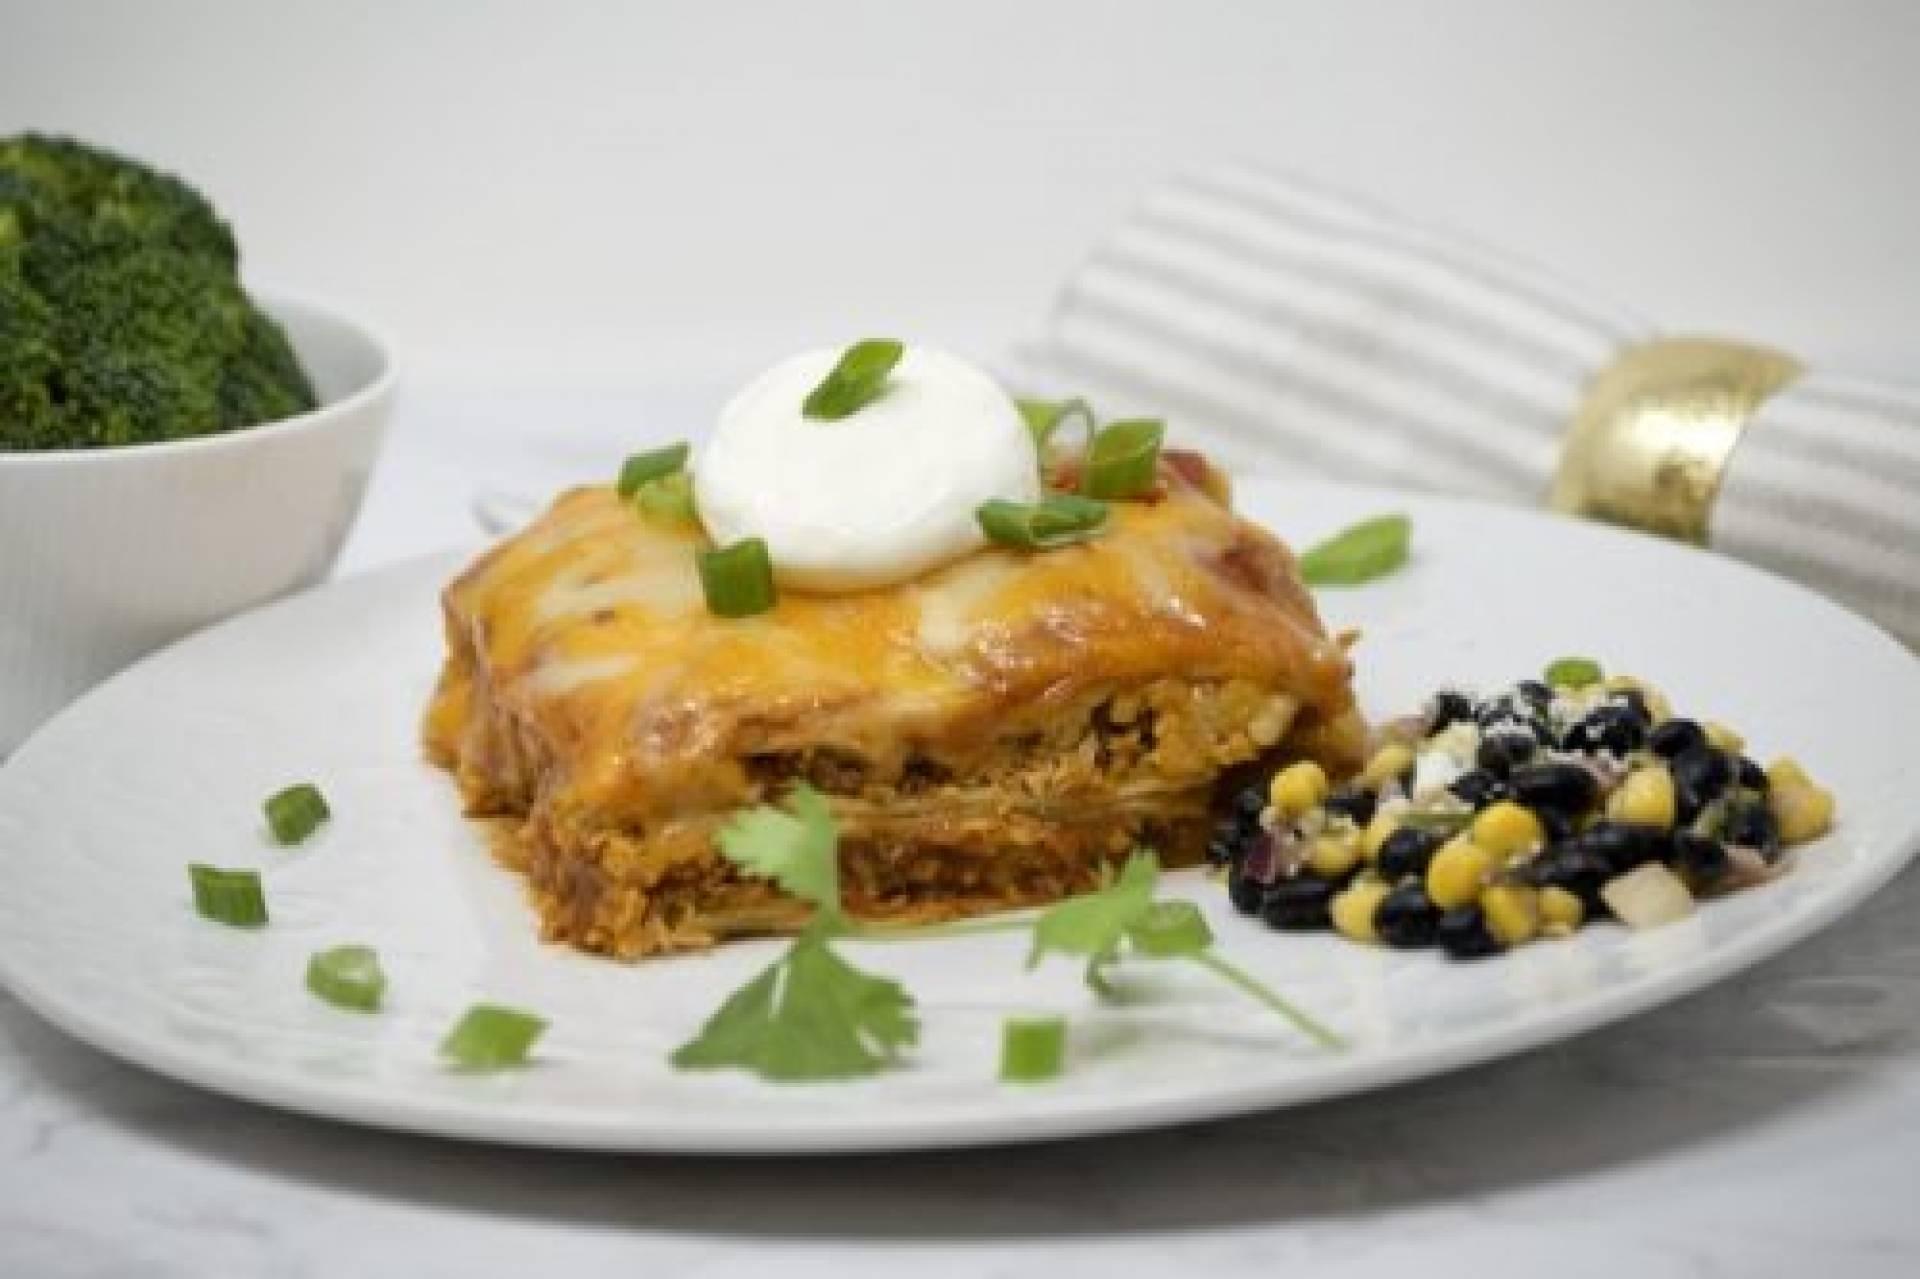 Shredded Chicken Enchilada Casserole